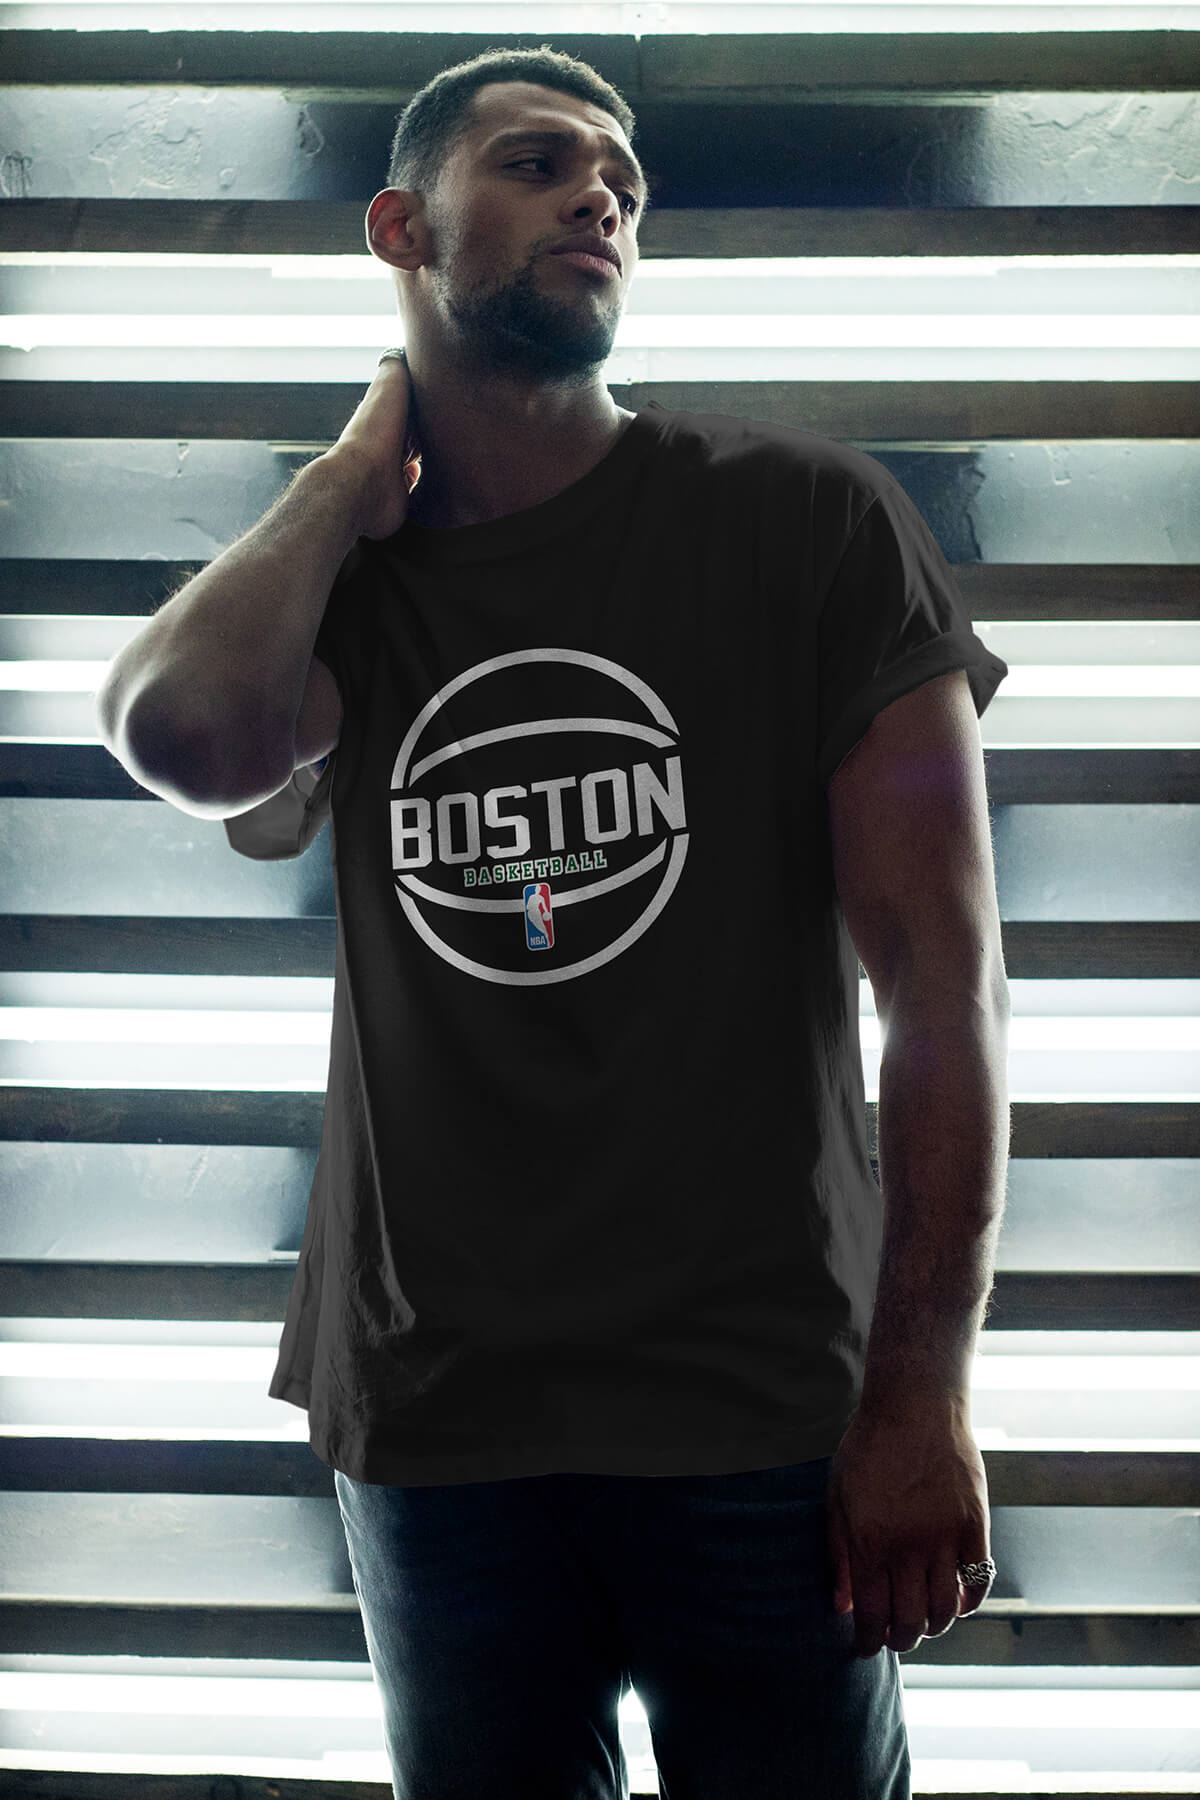 Boston Celtics 30 Siyah Erkek Oversize Tshirt - Tişört